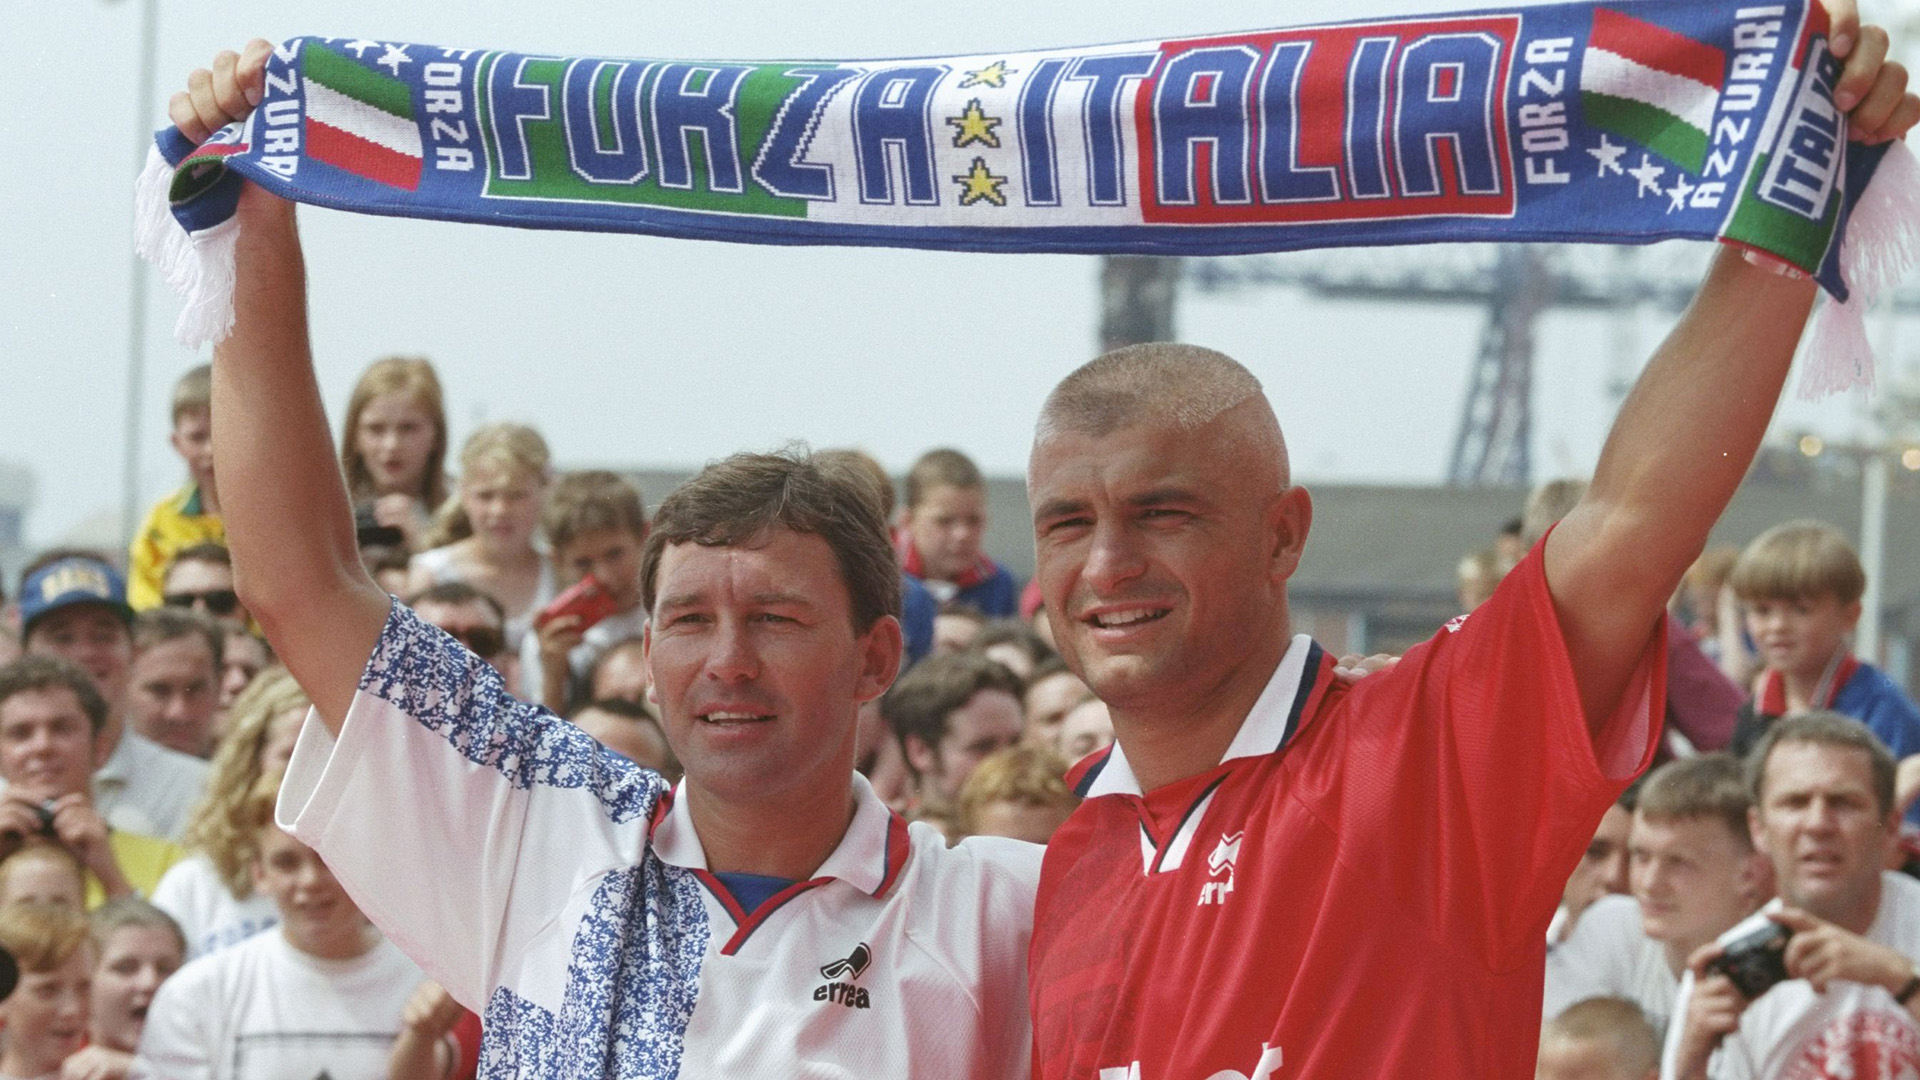 Bryan Robson Fabrizio Ravanelli Middlesbrough